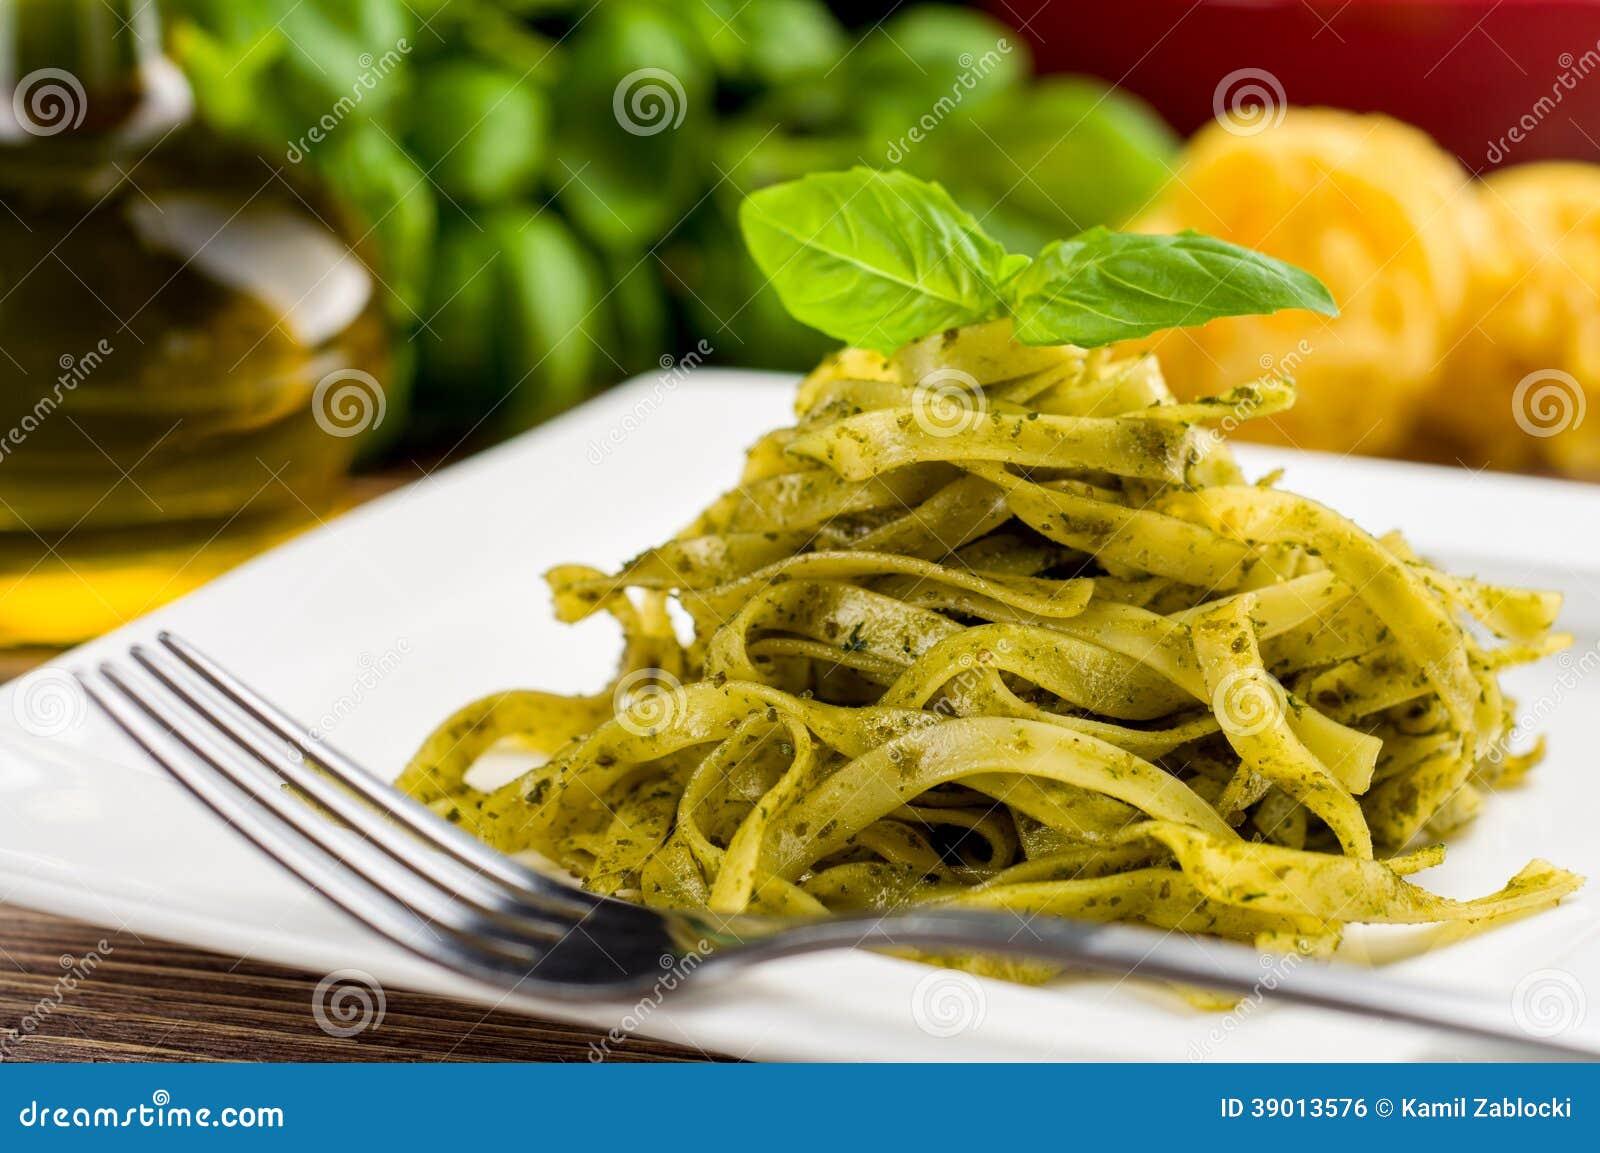 Tagliatelle With Pesto Stock Photo - Image: 39013576